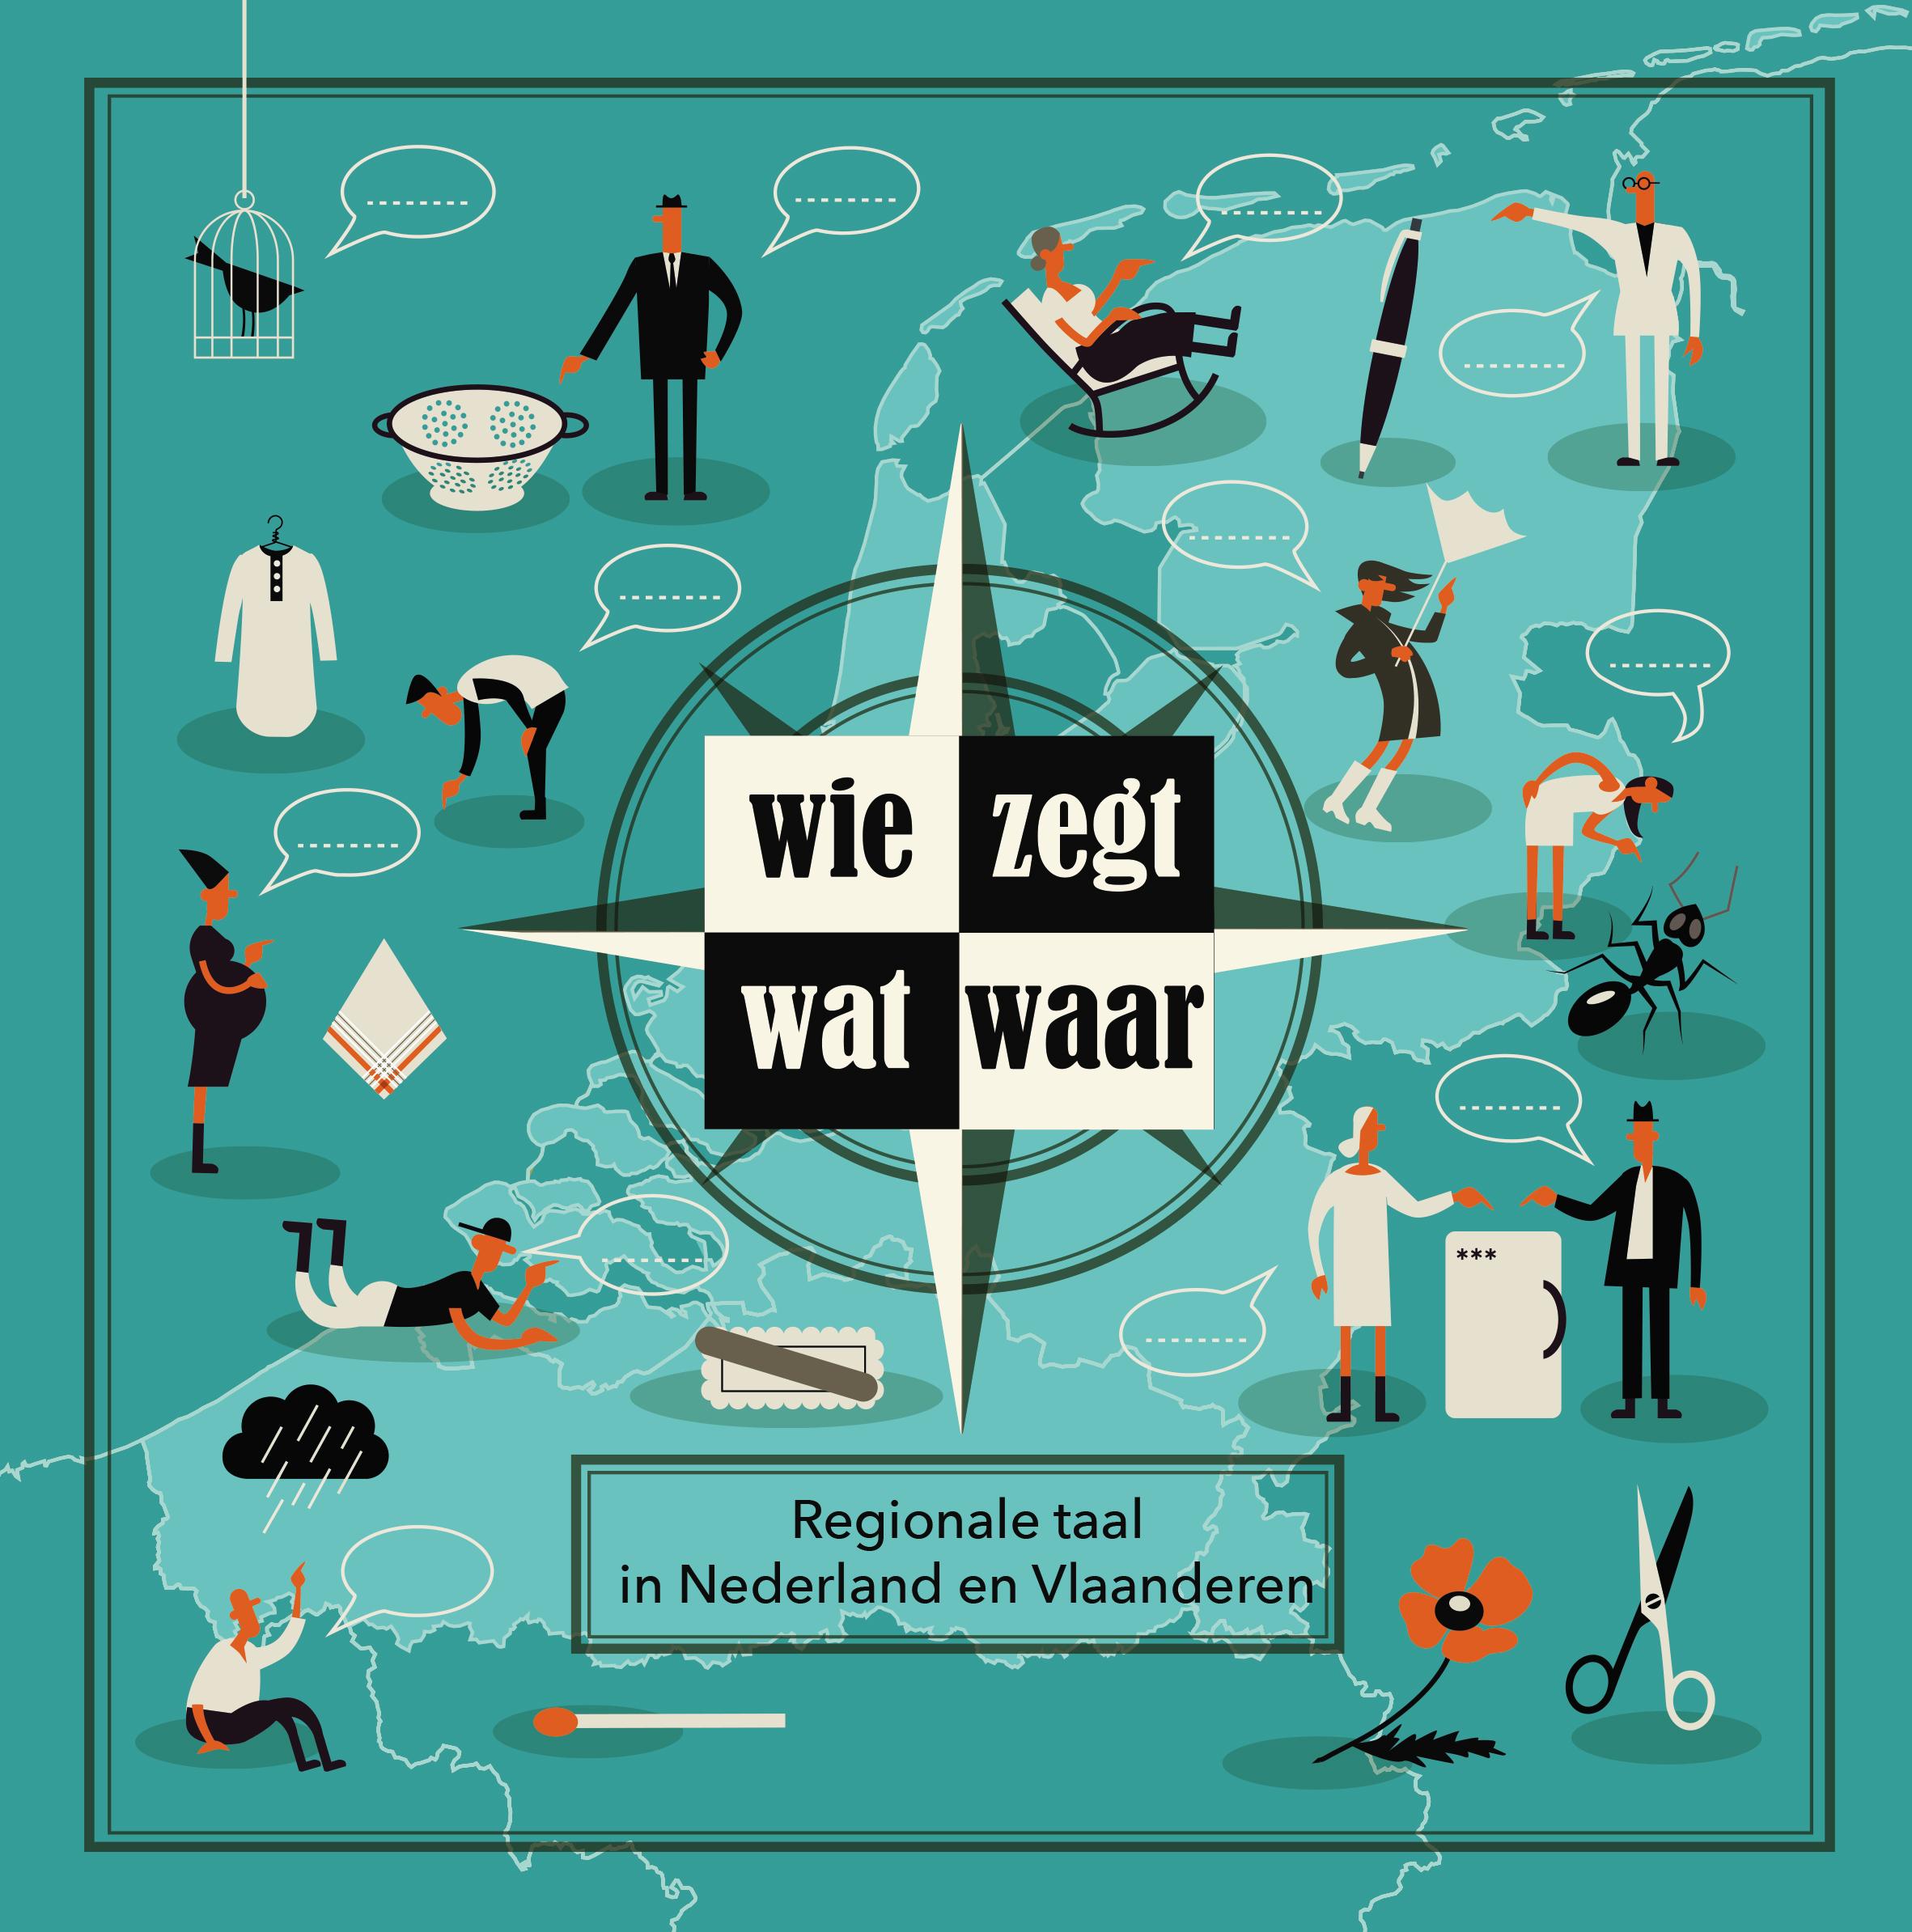 Boek: Wie zegt wat waar? Regionale taal in Nederland en Vlaanderen